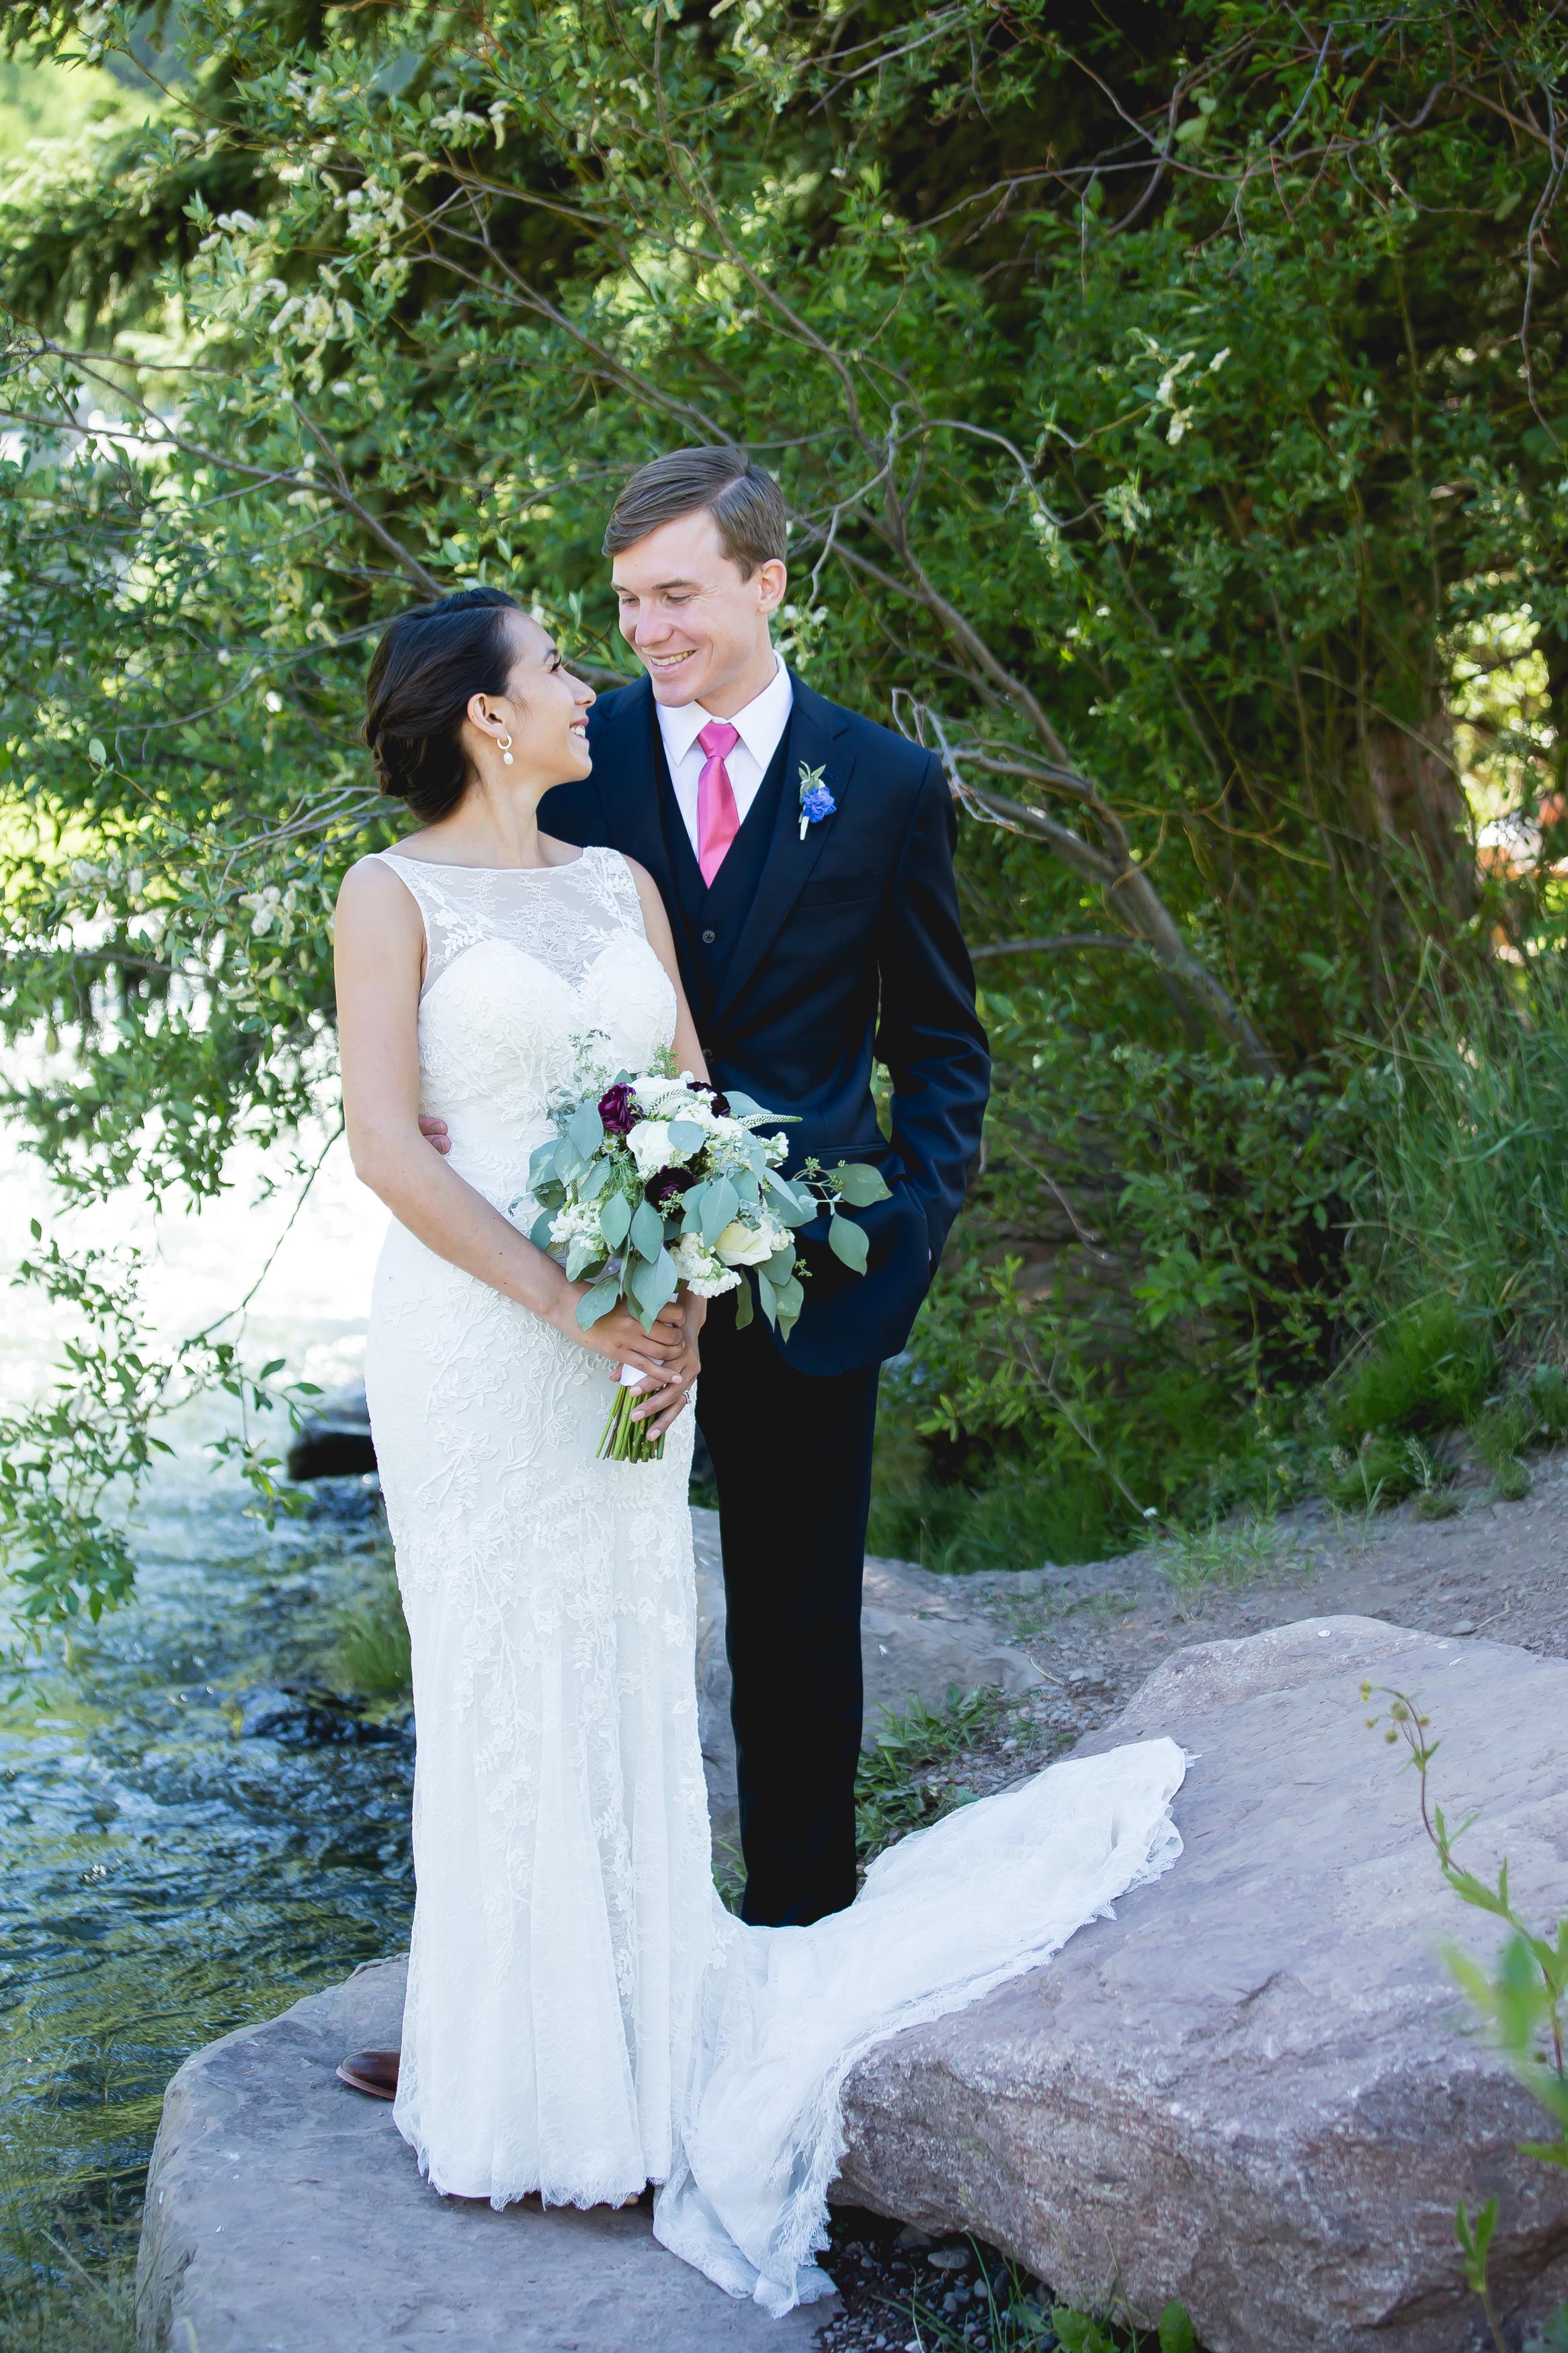 St. Patrick's Catholic Church, Telluride Colorado and Durango Wedding Photographers Alexi Hubbell Photography